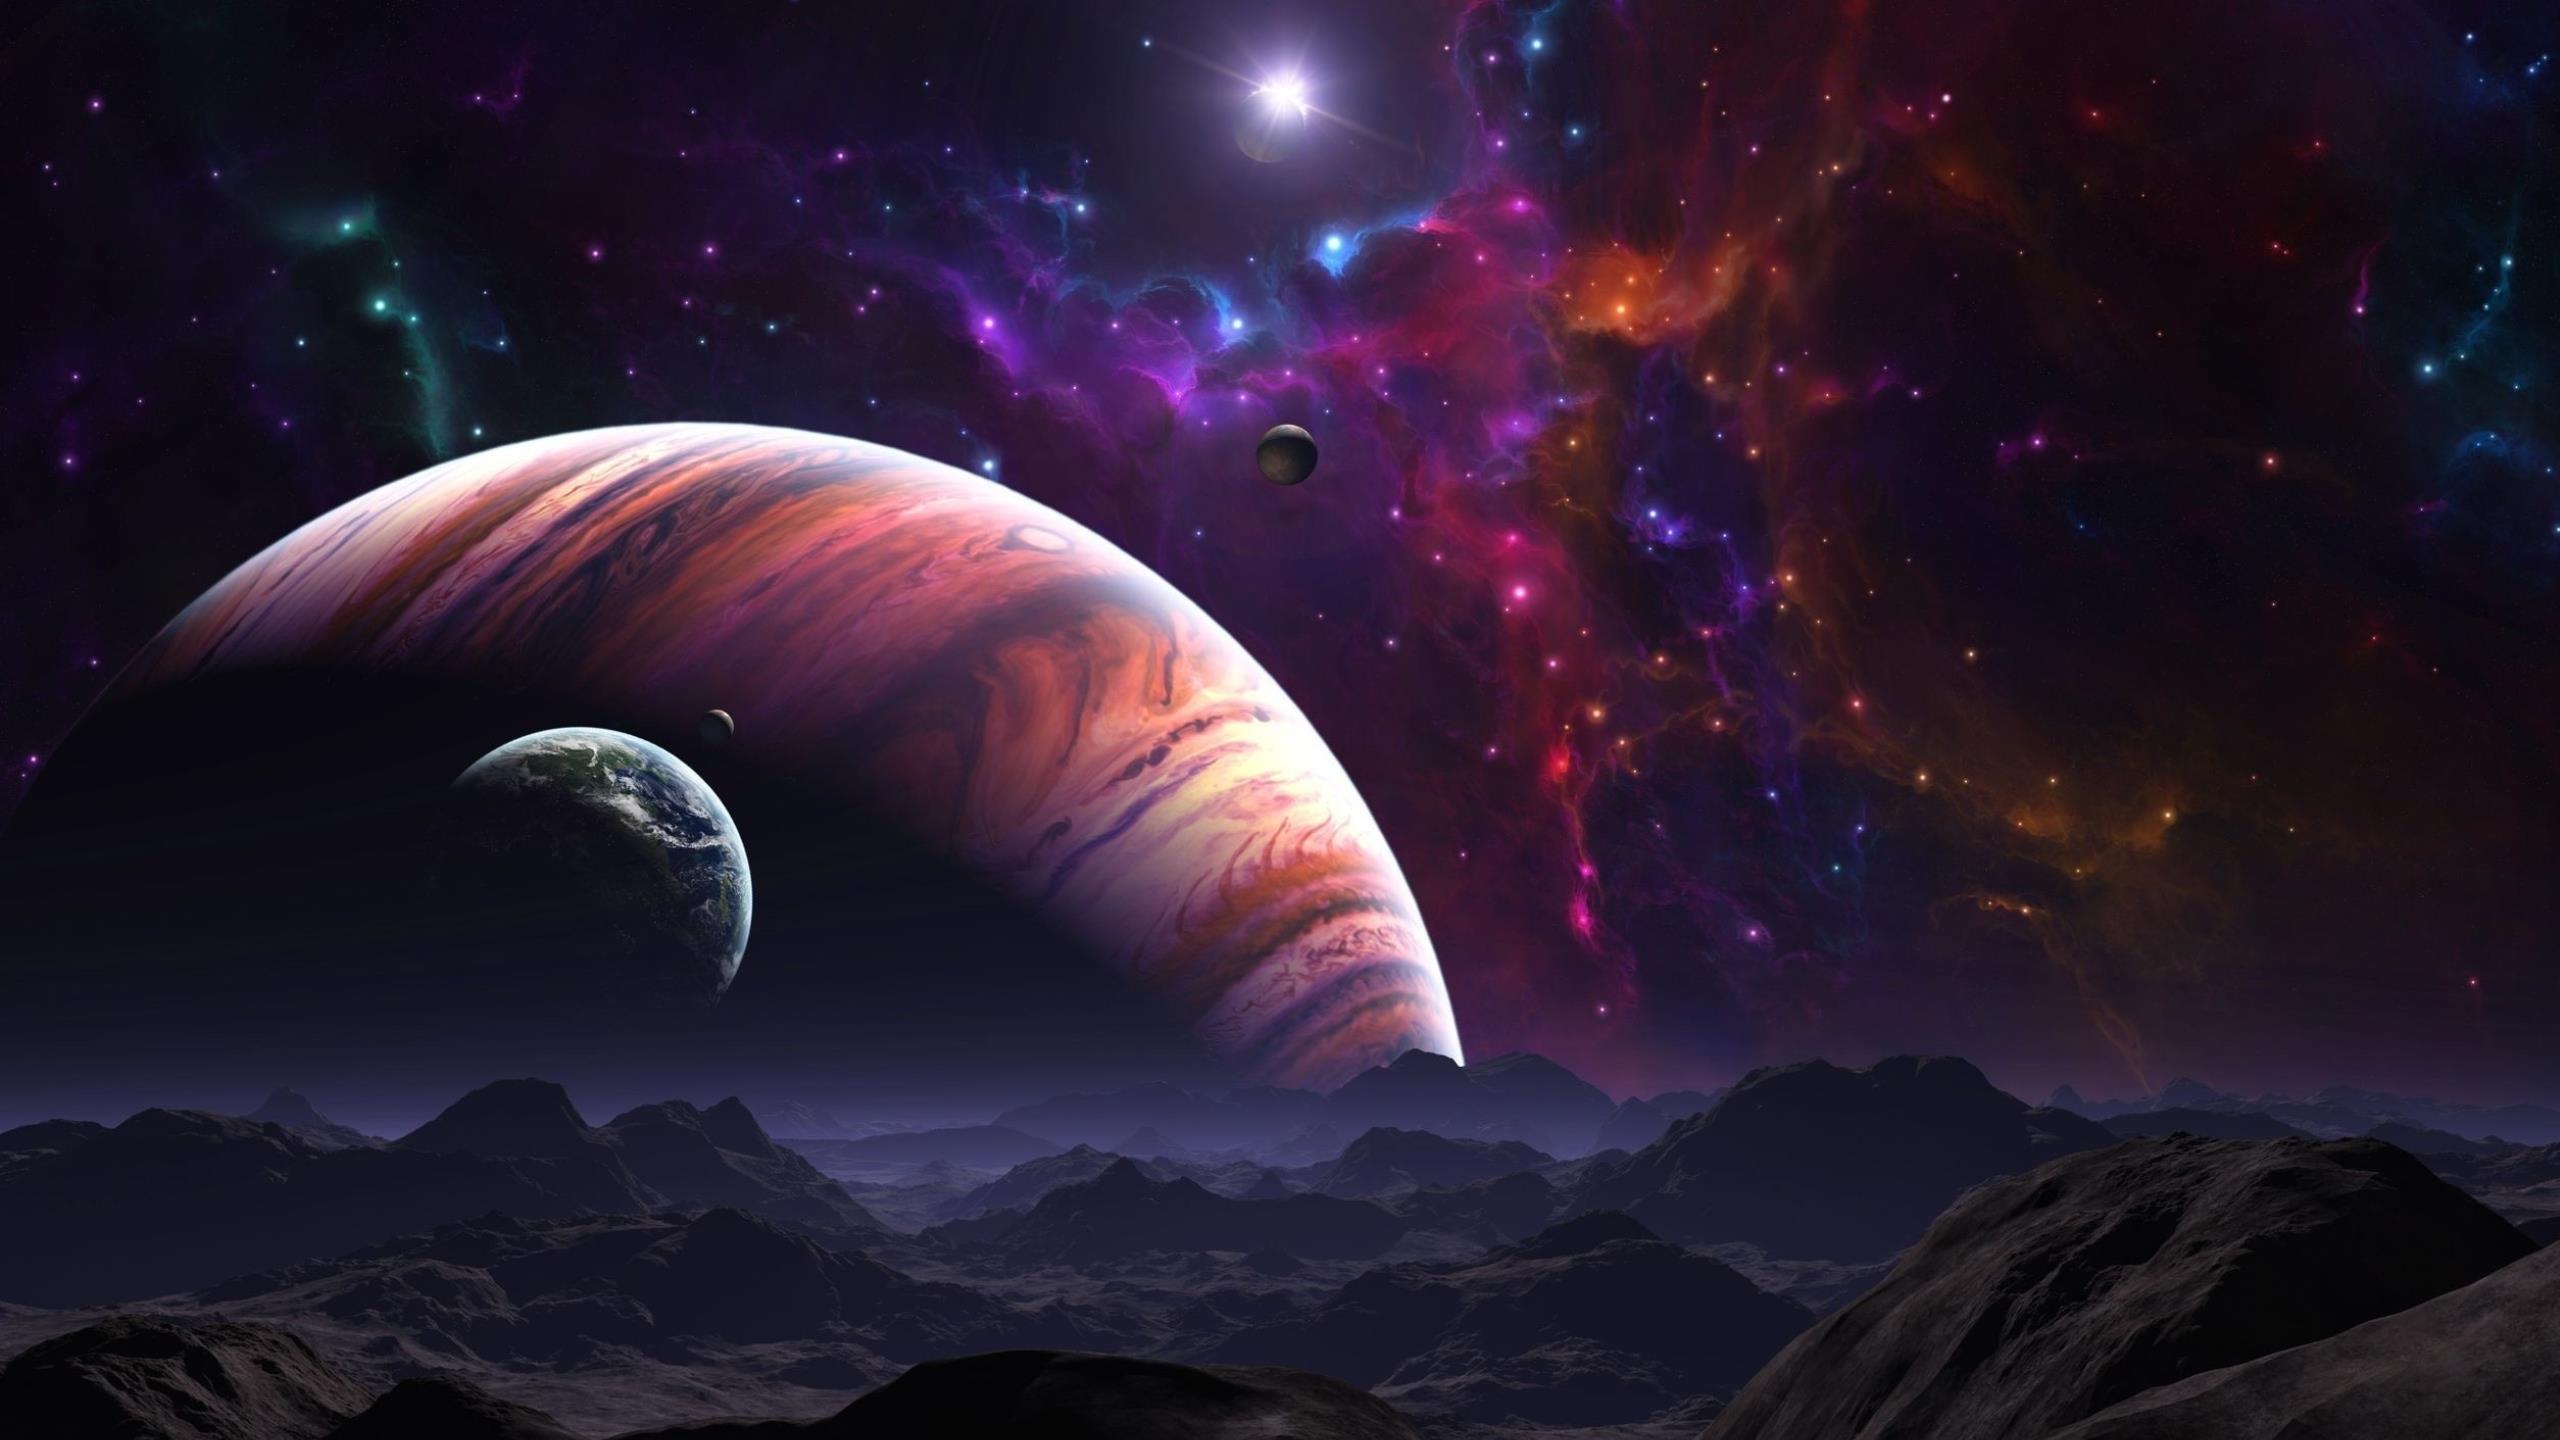 High Resolution Wallpaper | Celestial 2560x1440 px